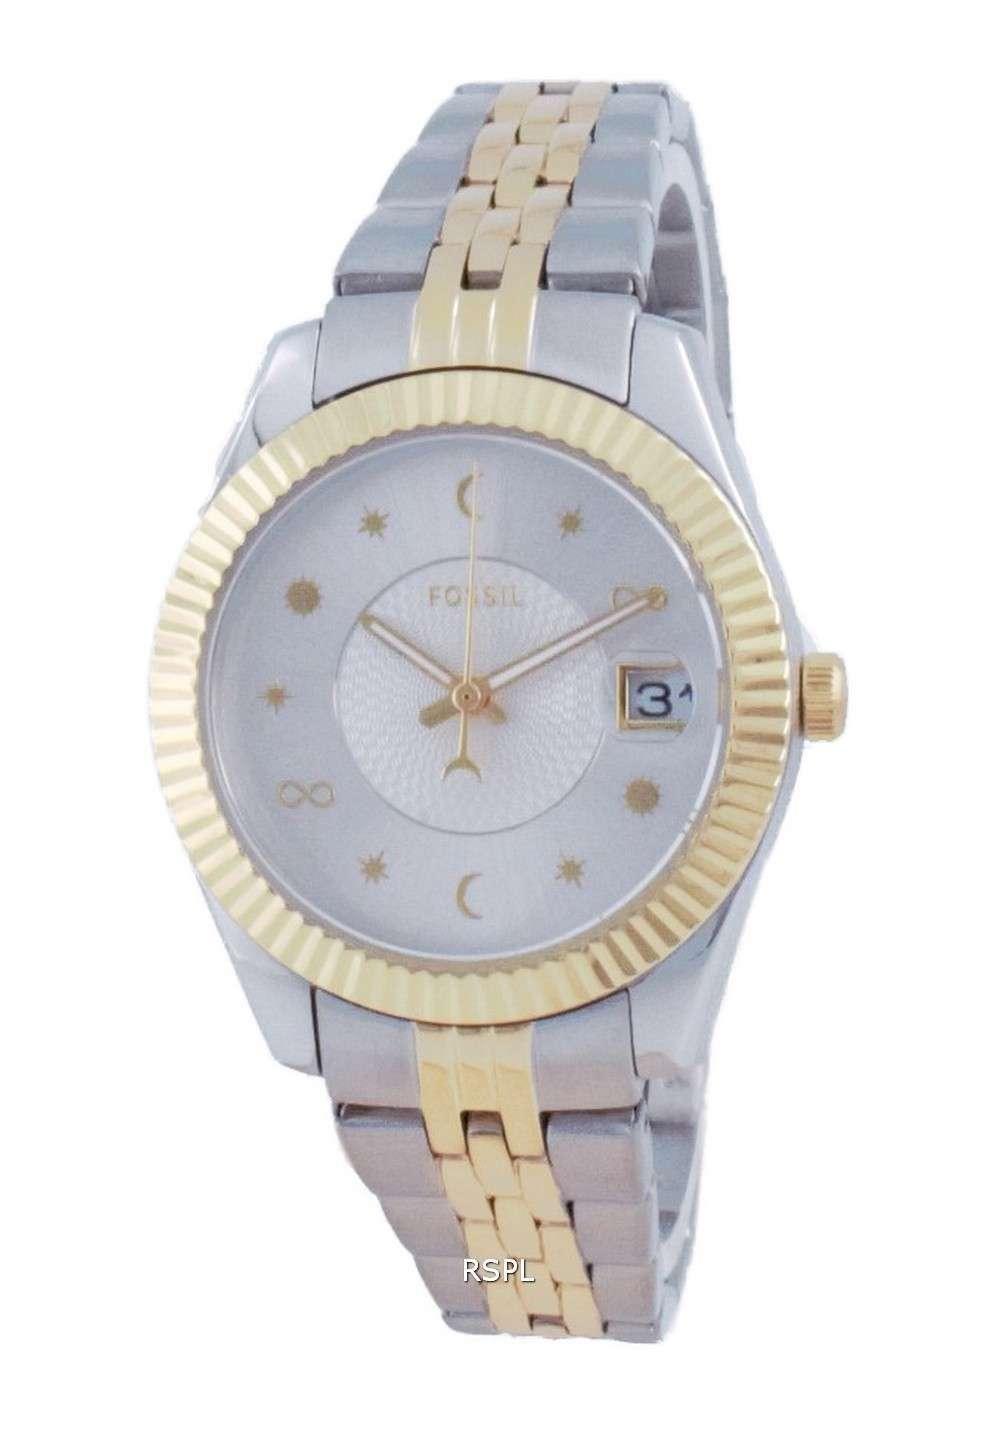 Fossil Scarlette Mini reloj de cuarzo de acero inoxidable ES5060 100M para mujer